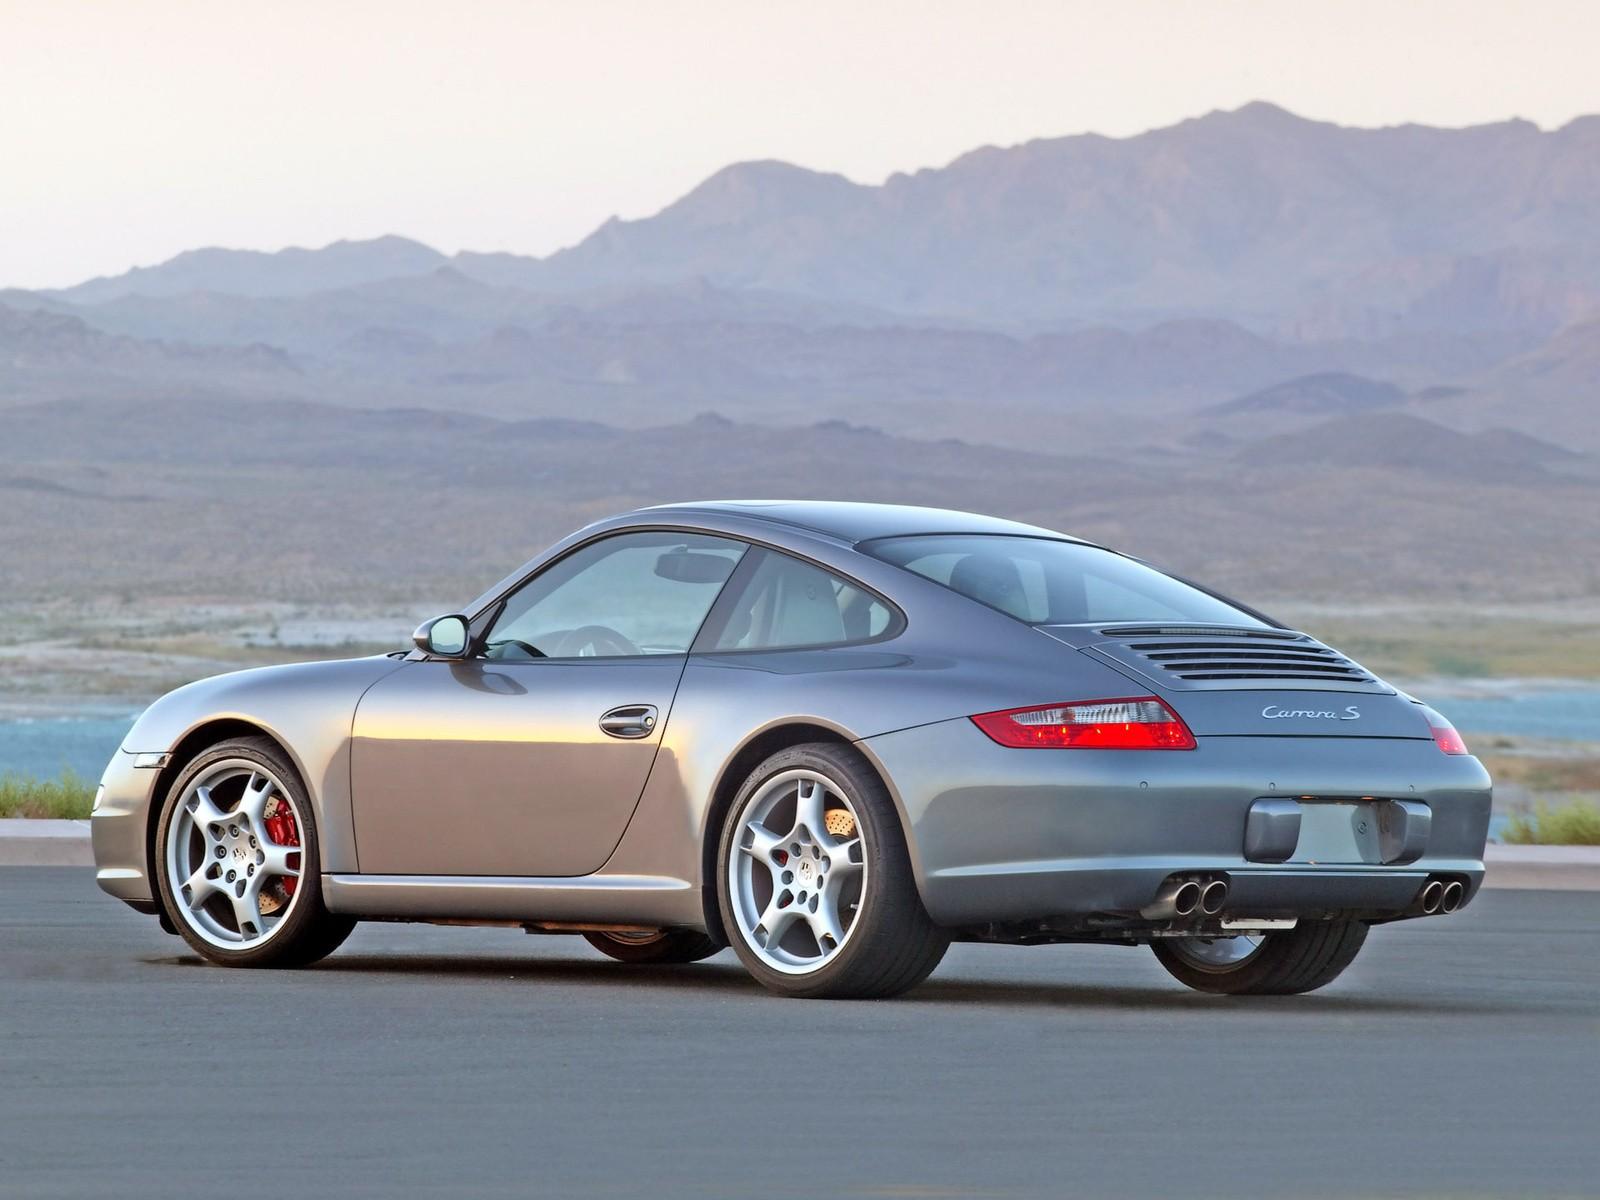 2010 Porsche 911 Carrera S photo - 2